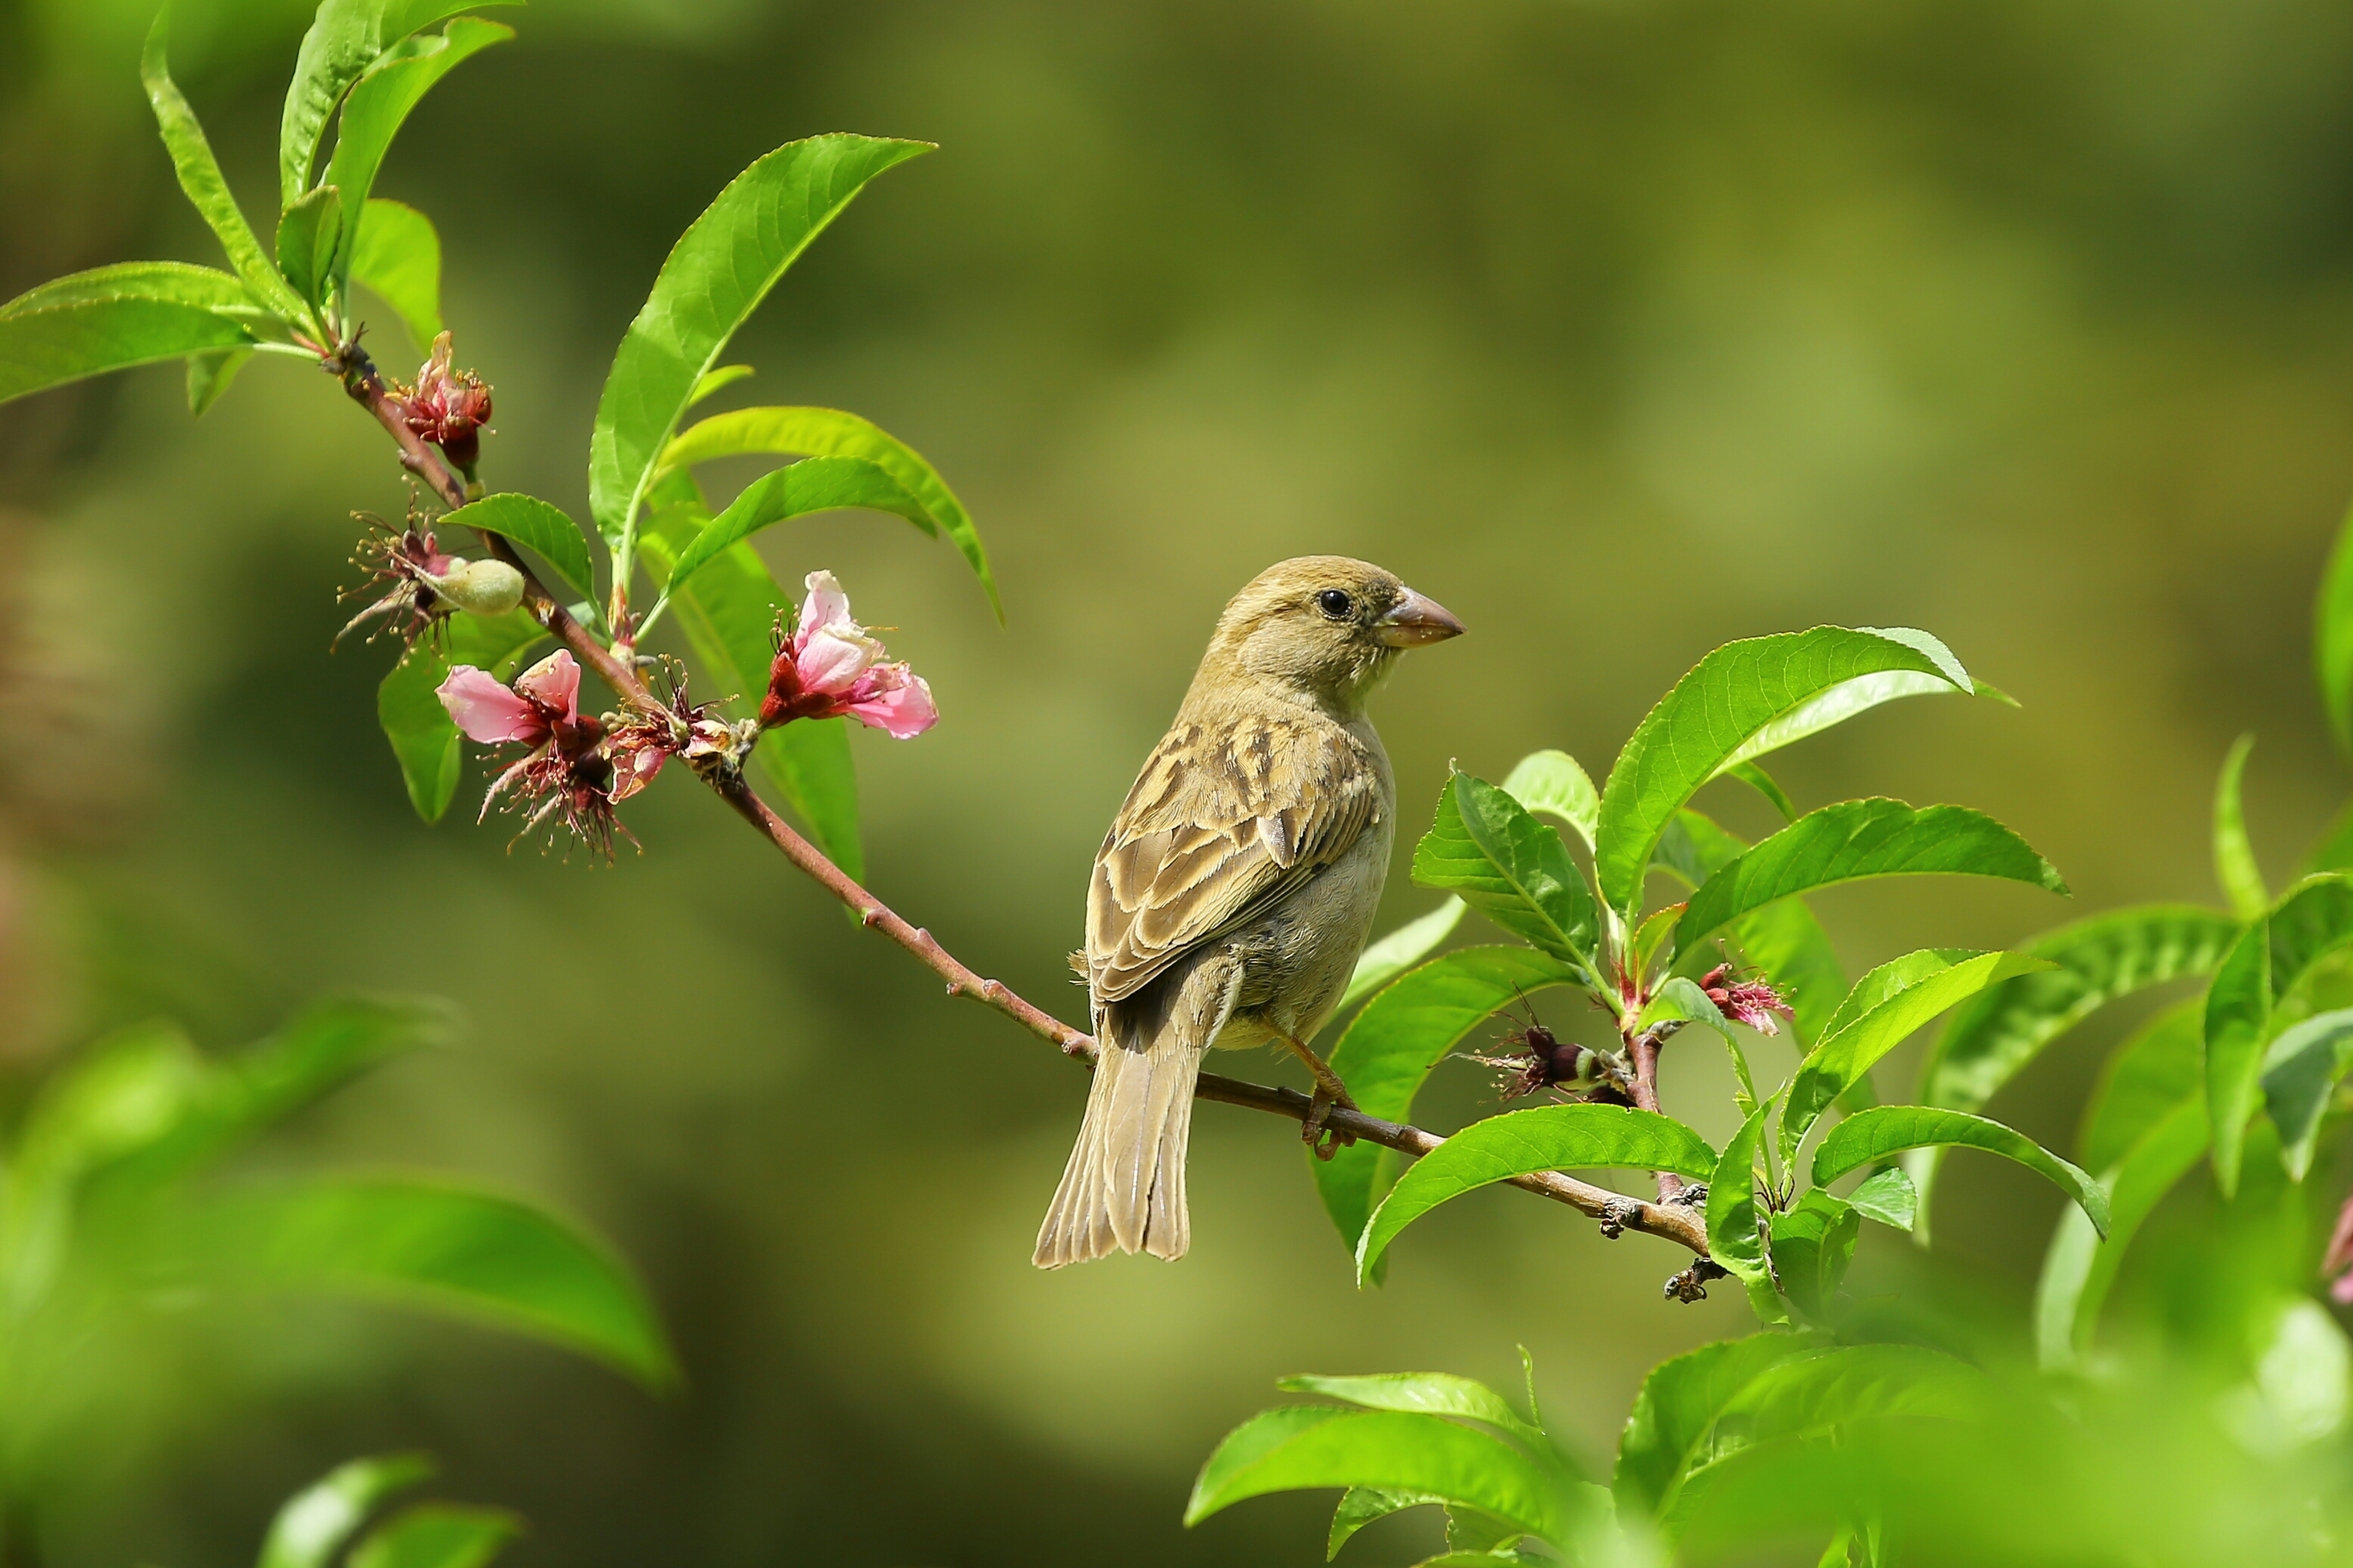 birdie on a branch